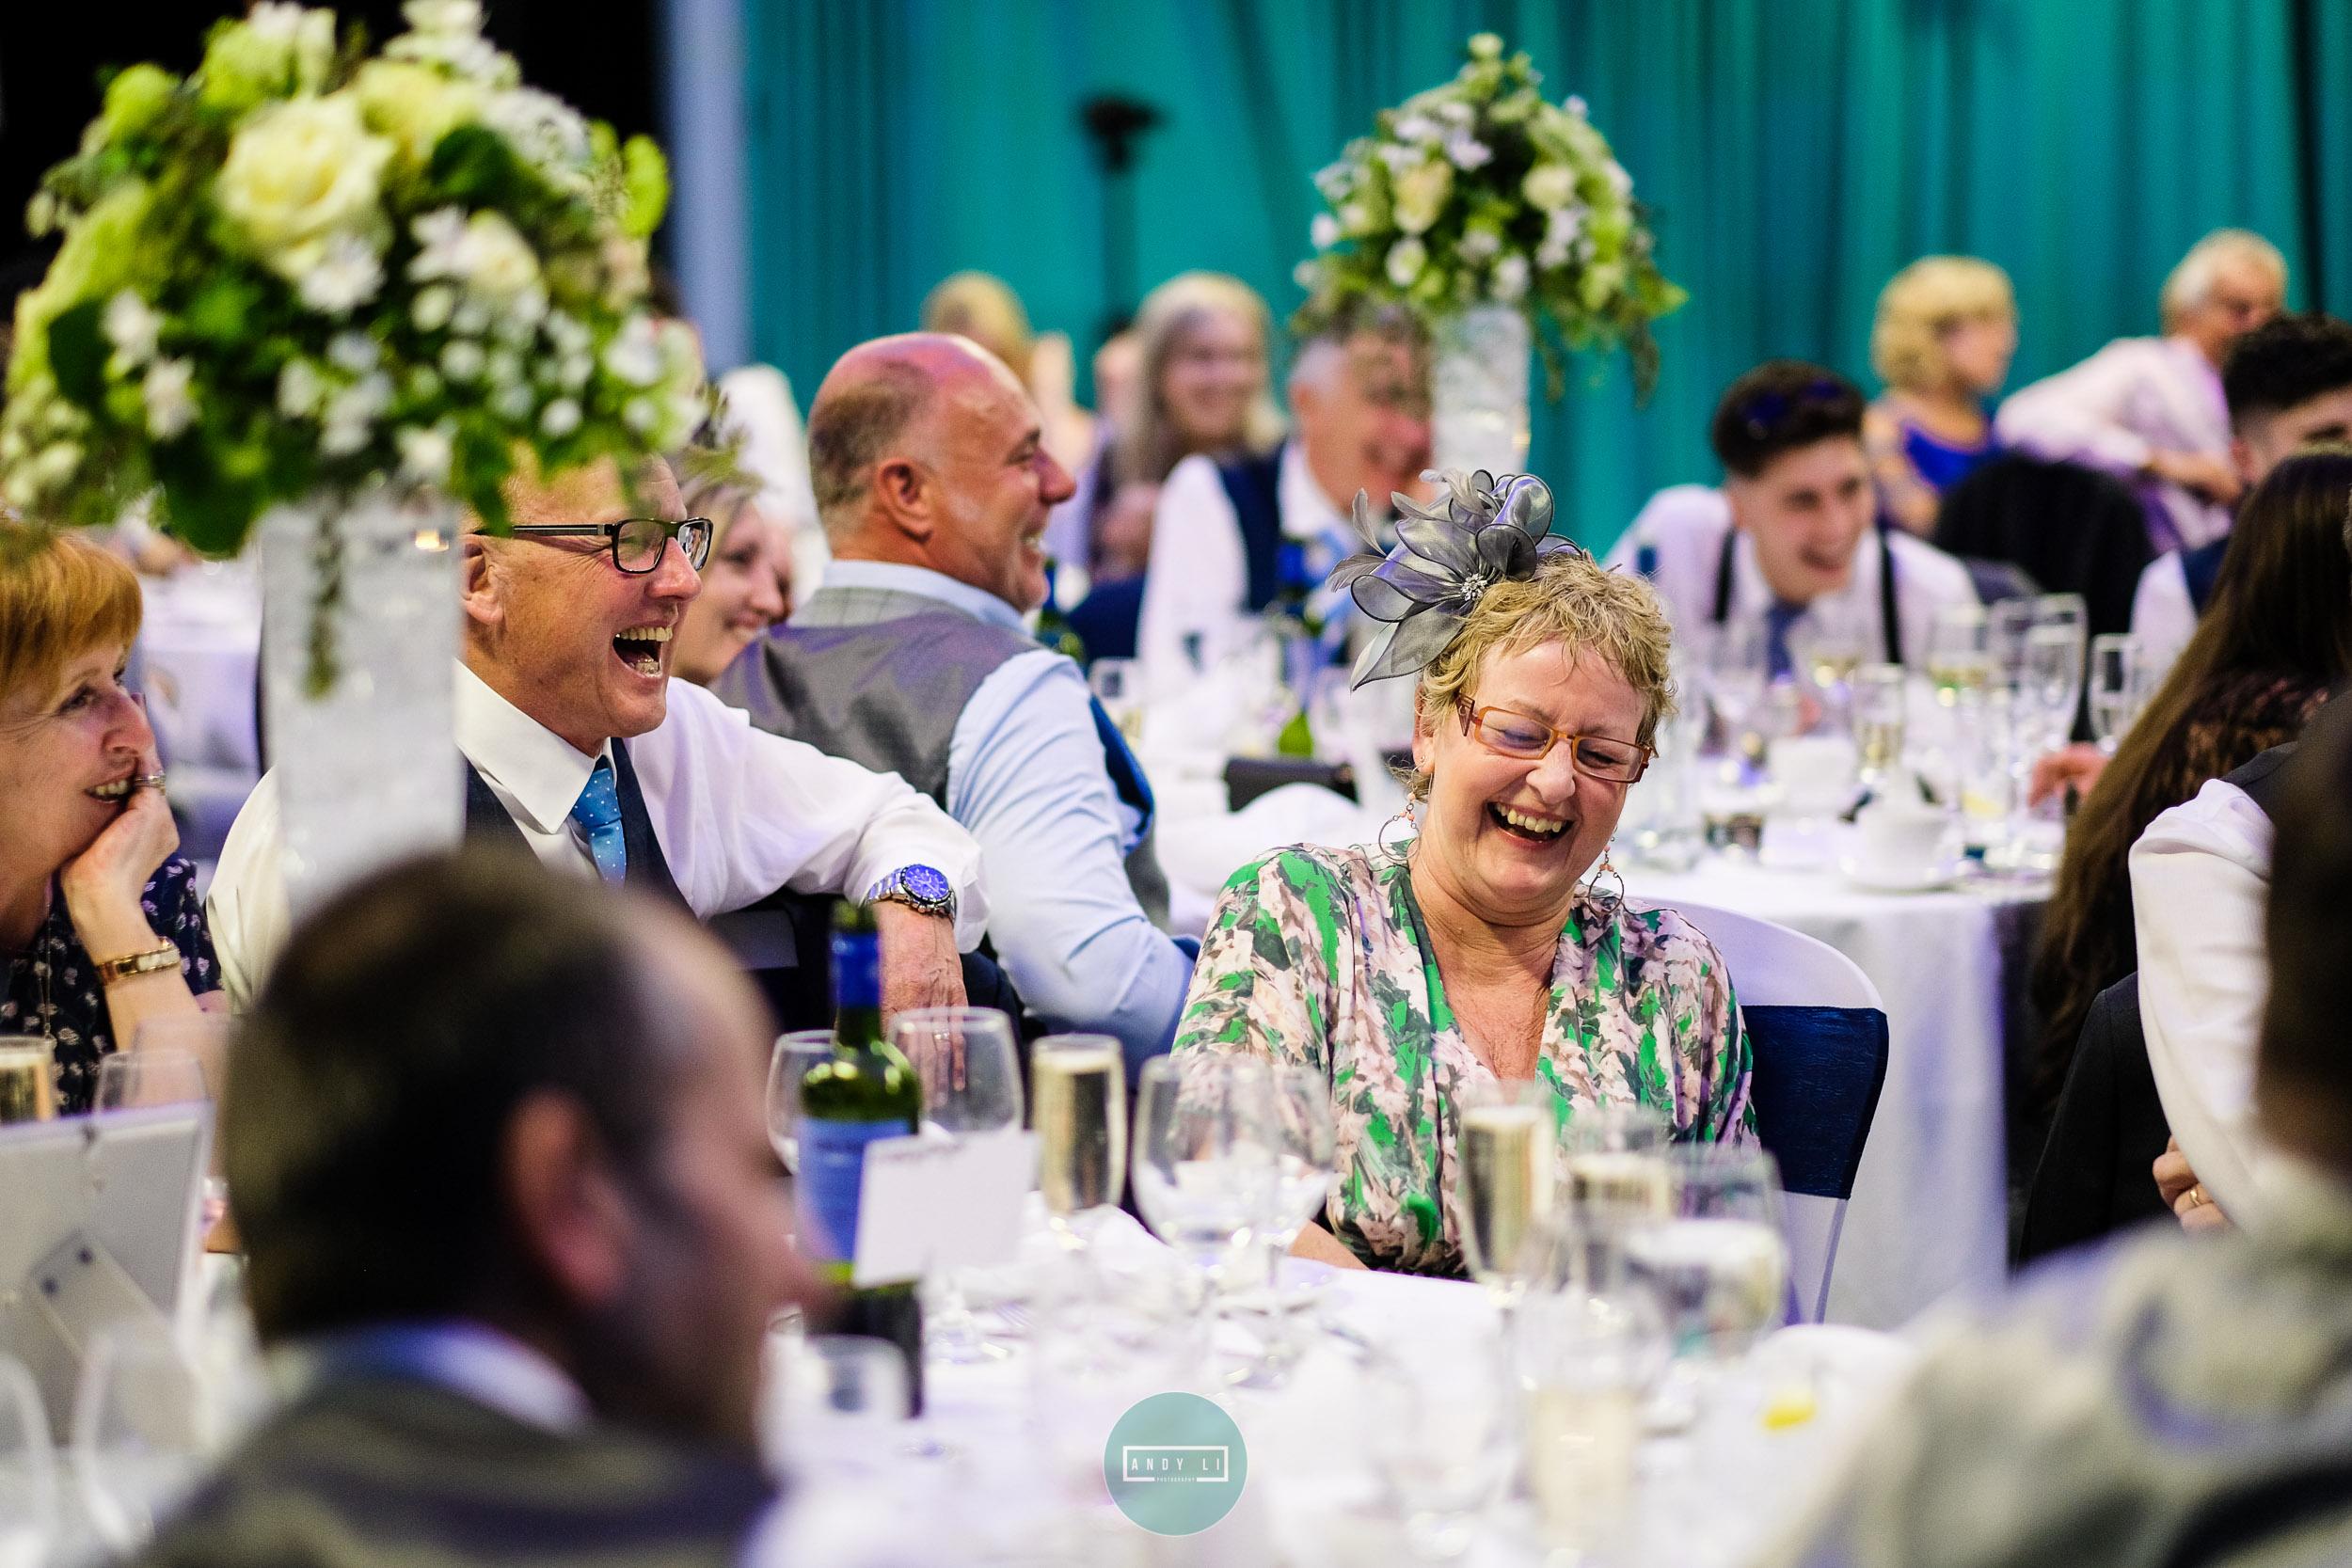 Lilleshall Hall Wedding Photographer-063-XPRO1395.jpg